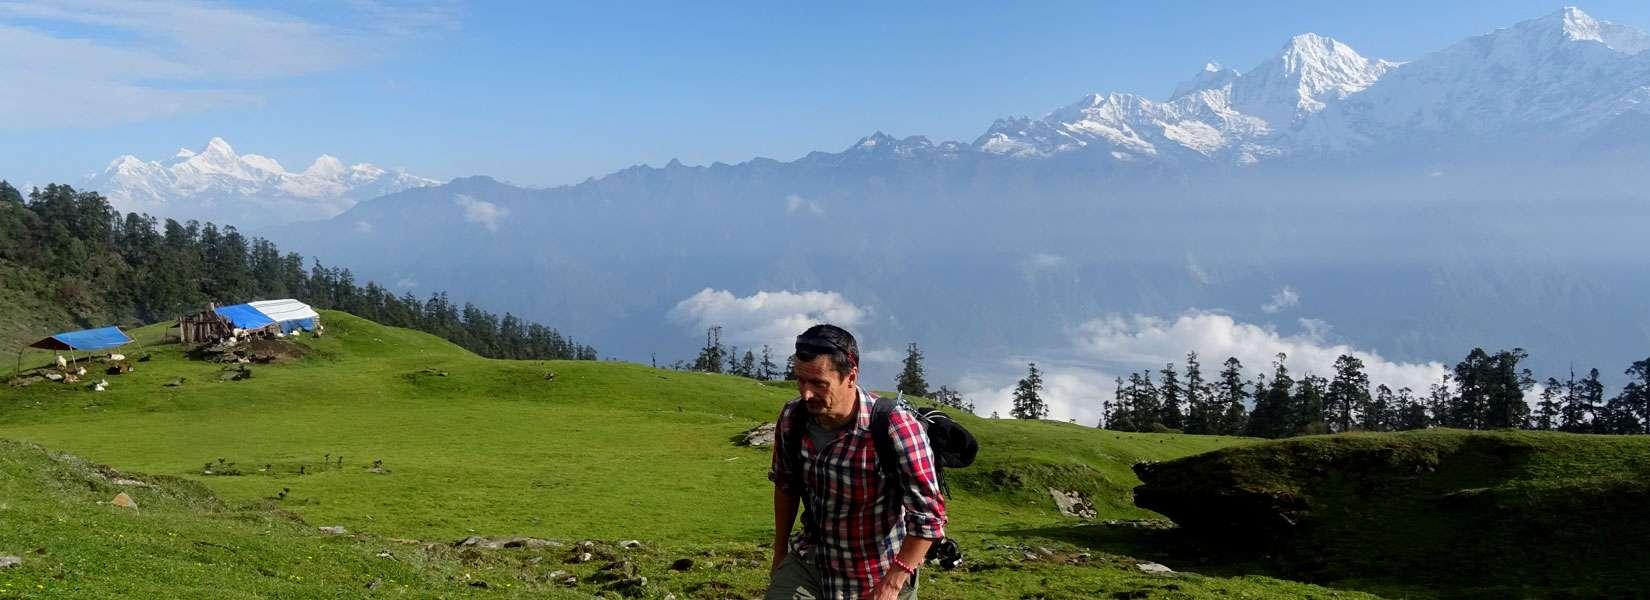 Machet Kharka and Ganesh Himal Range in the background